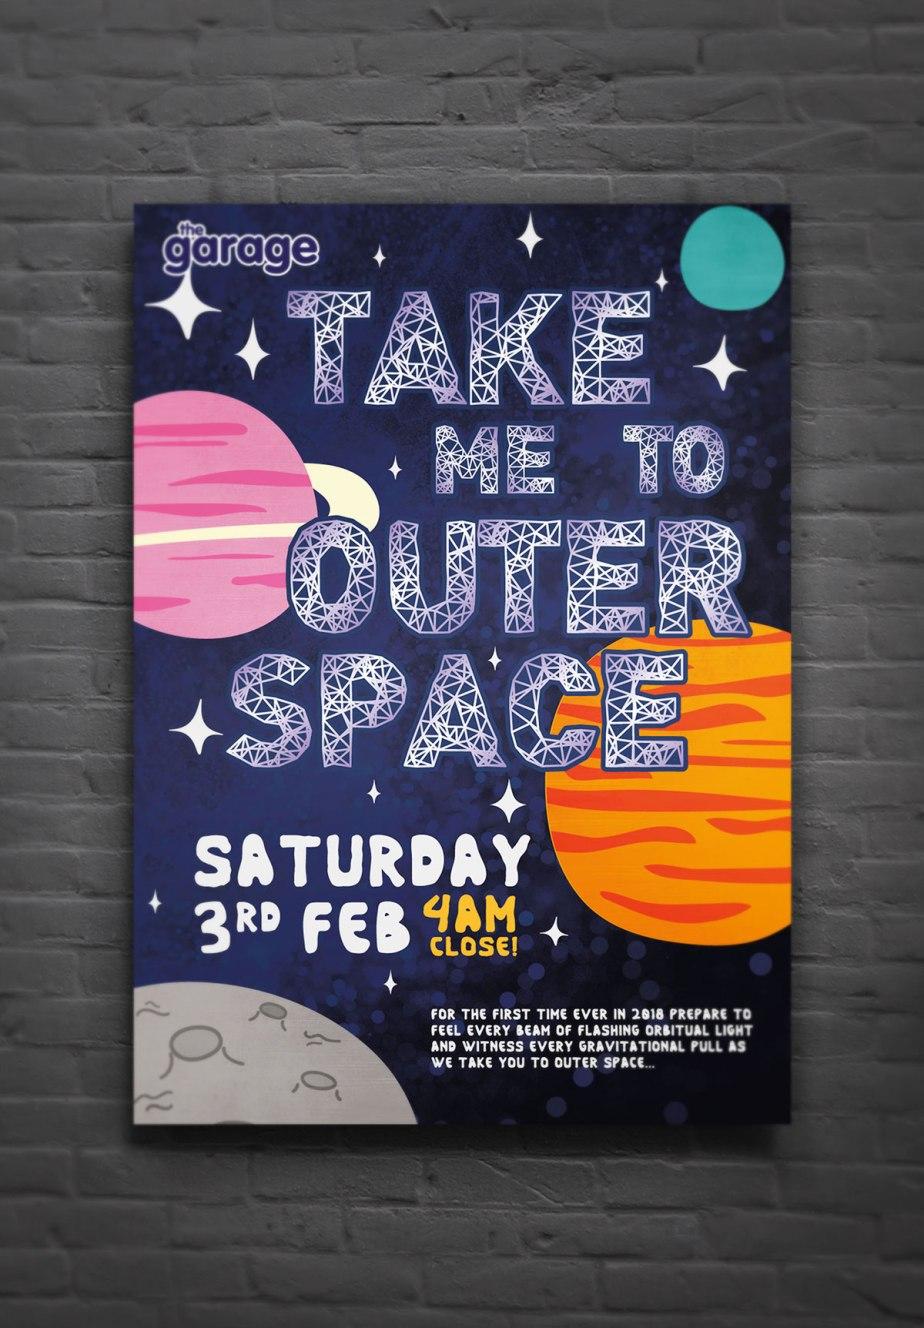 Garage_TakeMeToOuterSpace